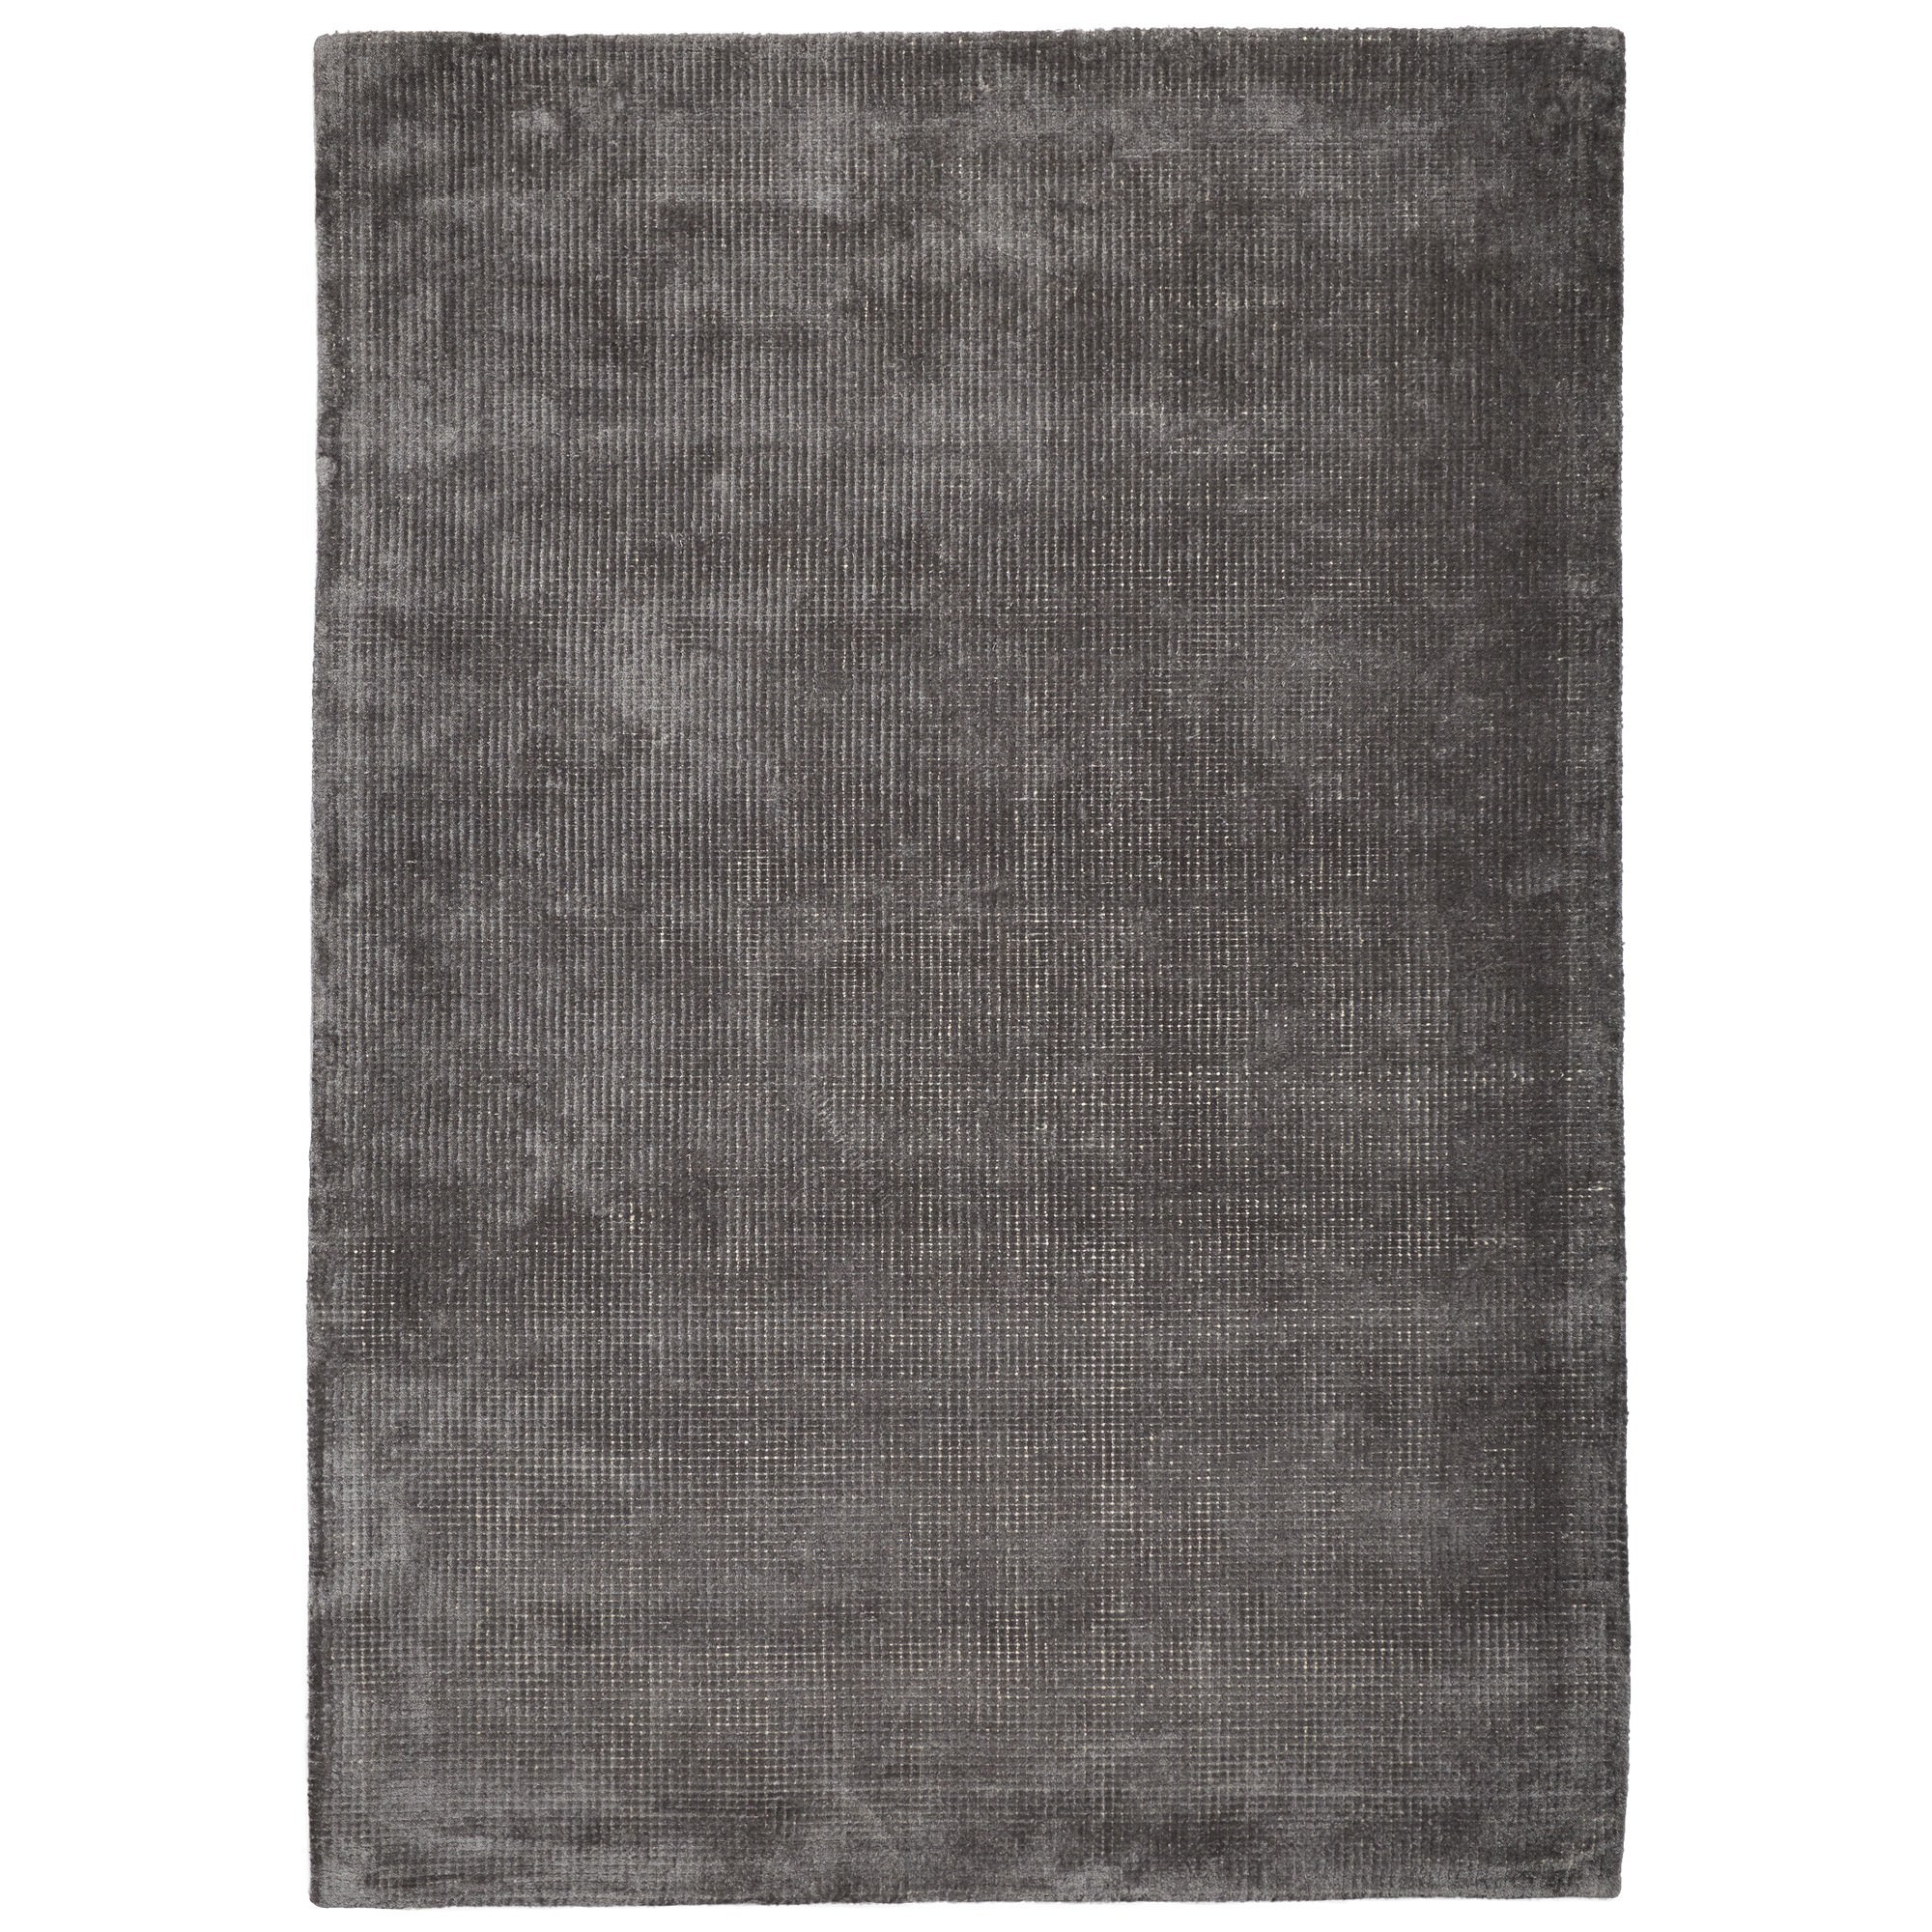 Corum Handmade Modern Rug, 225x155cm, Grey